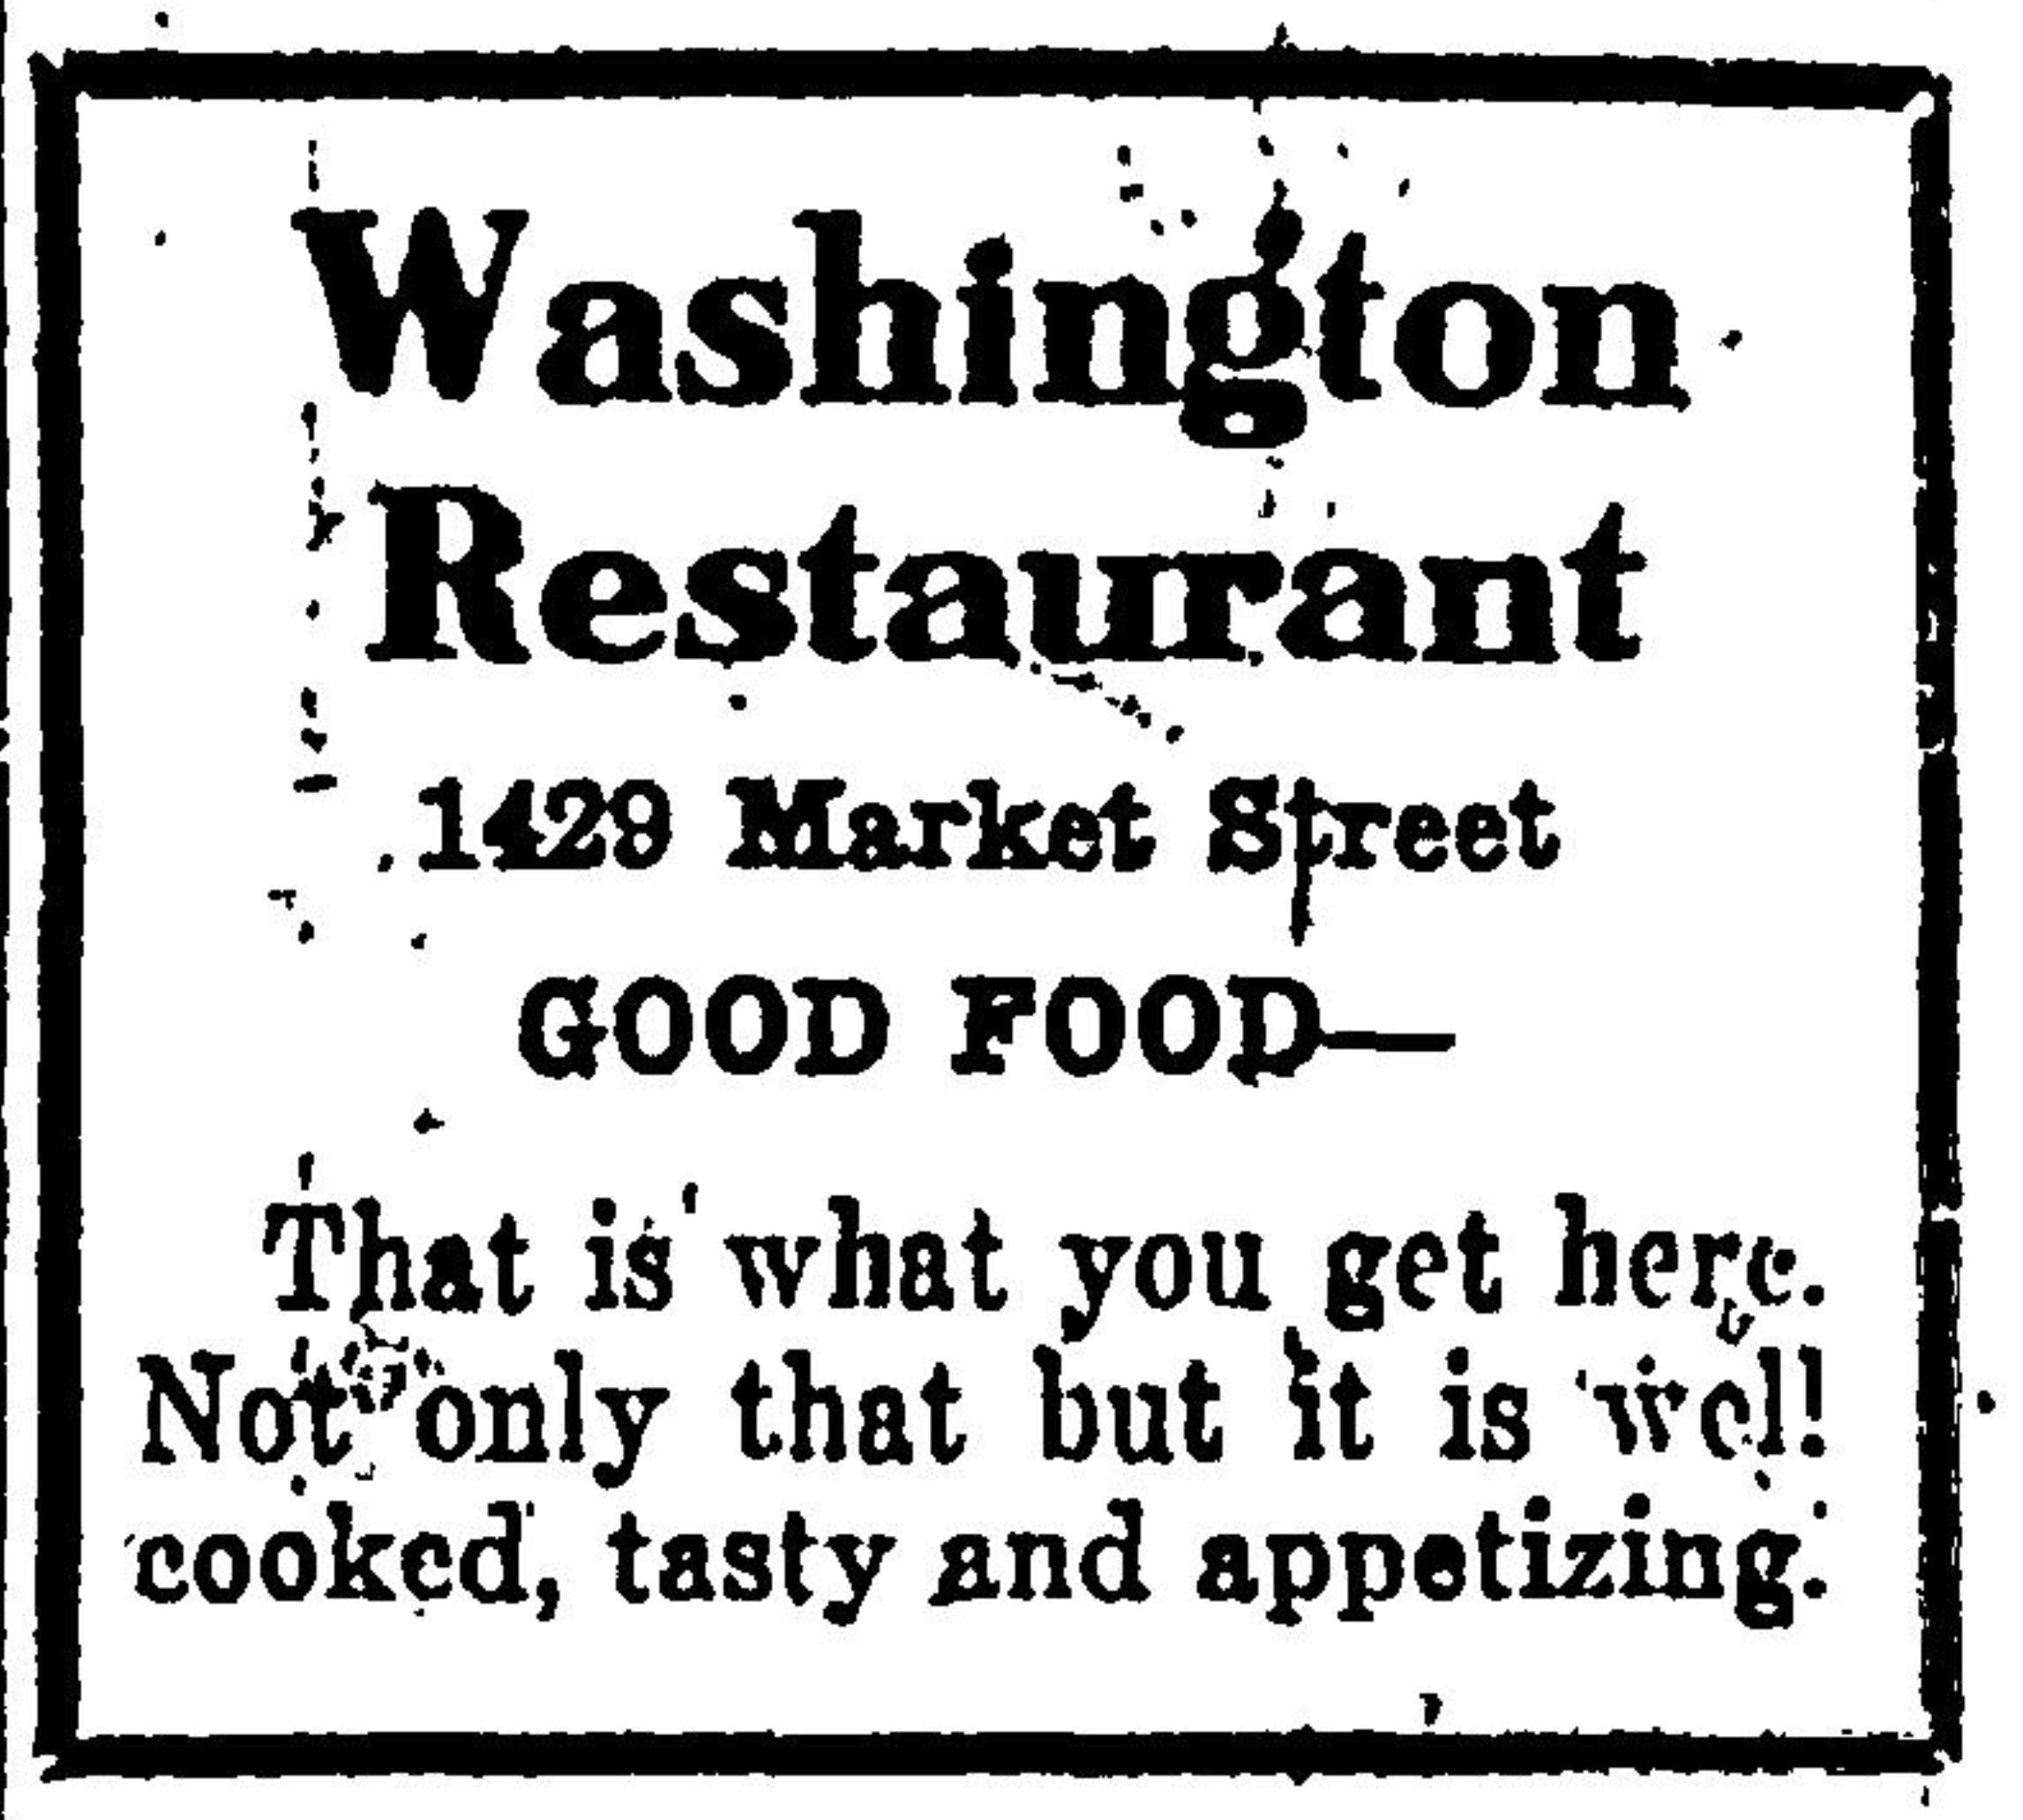 Washington Restaurant